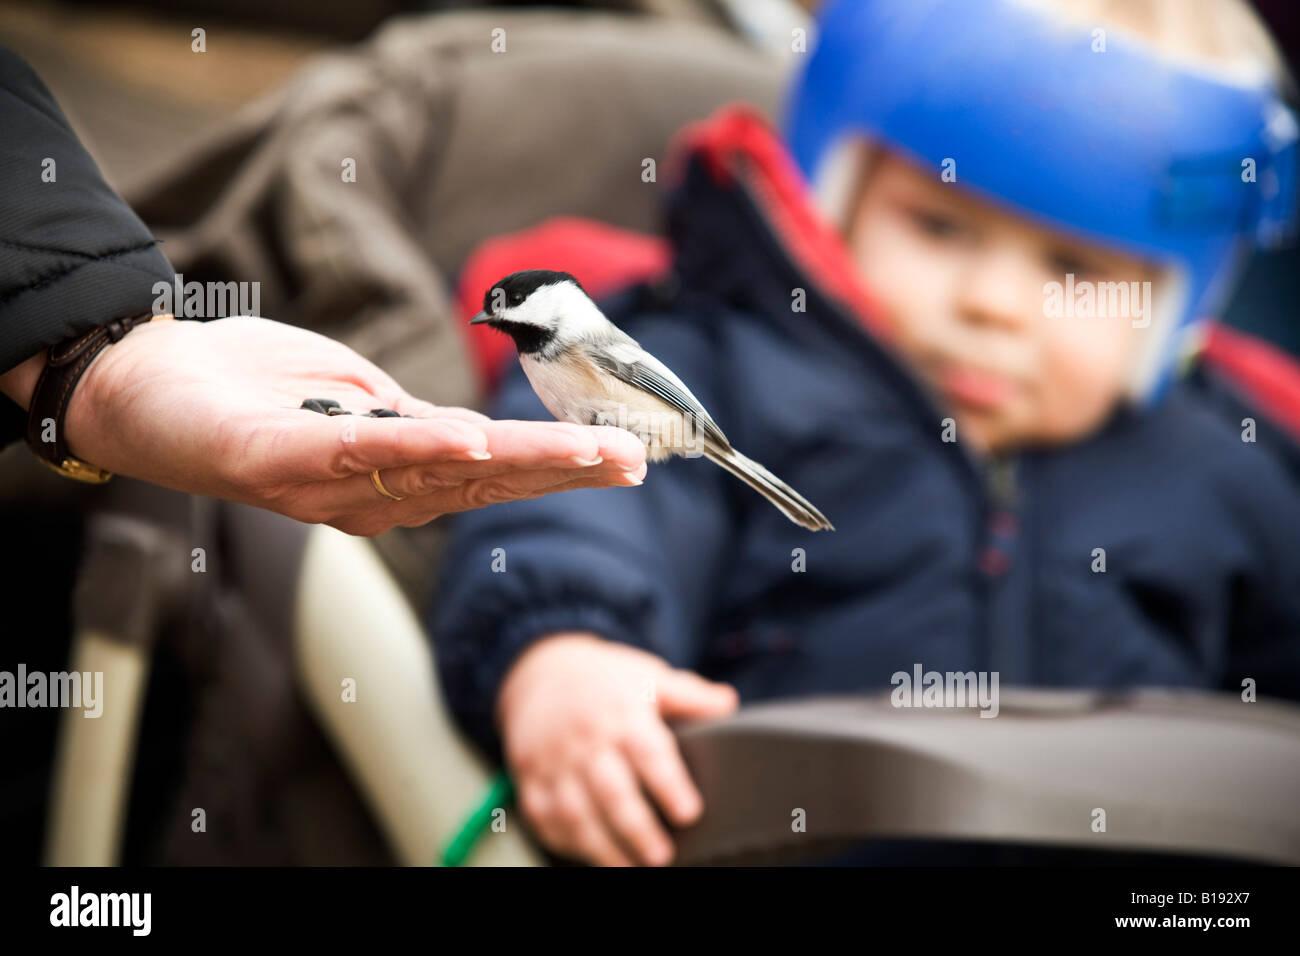 Un oiseau eating out of a person's hand Banque D'Images